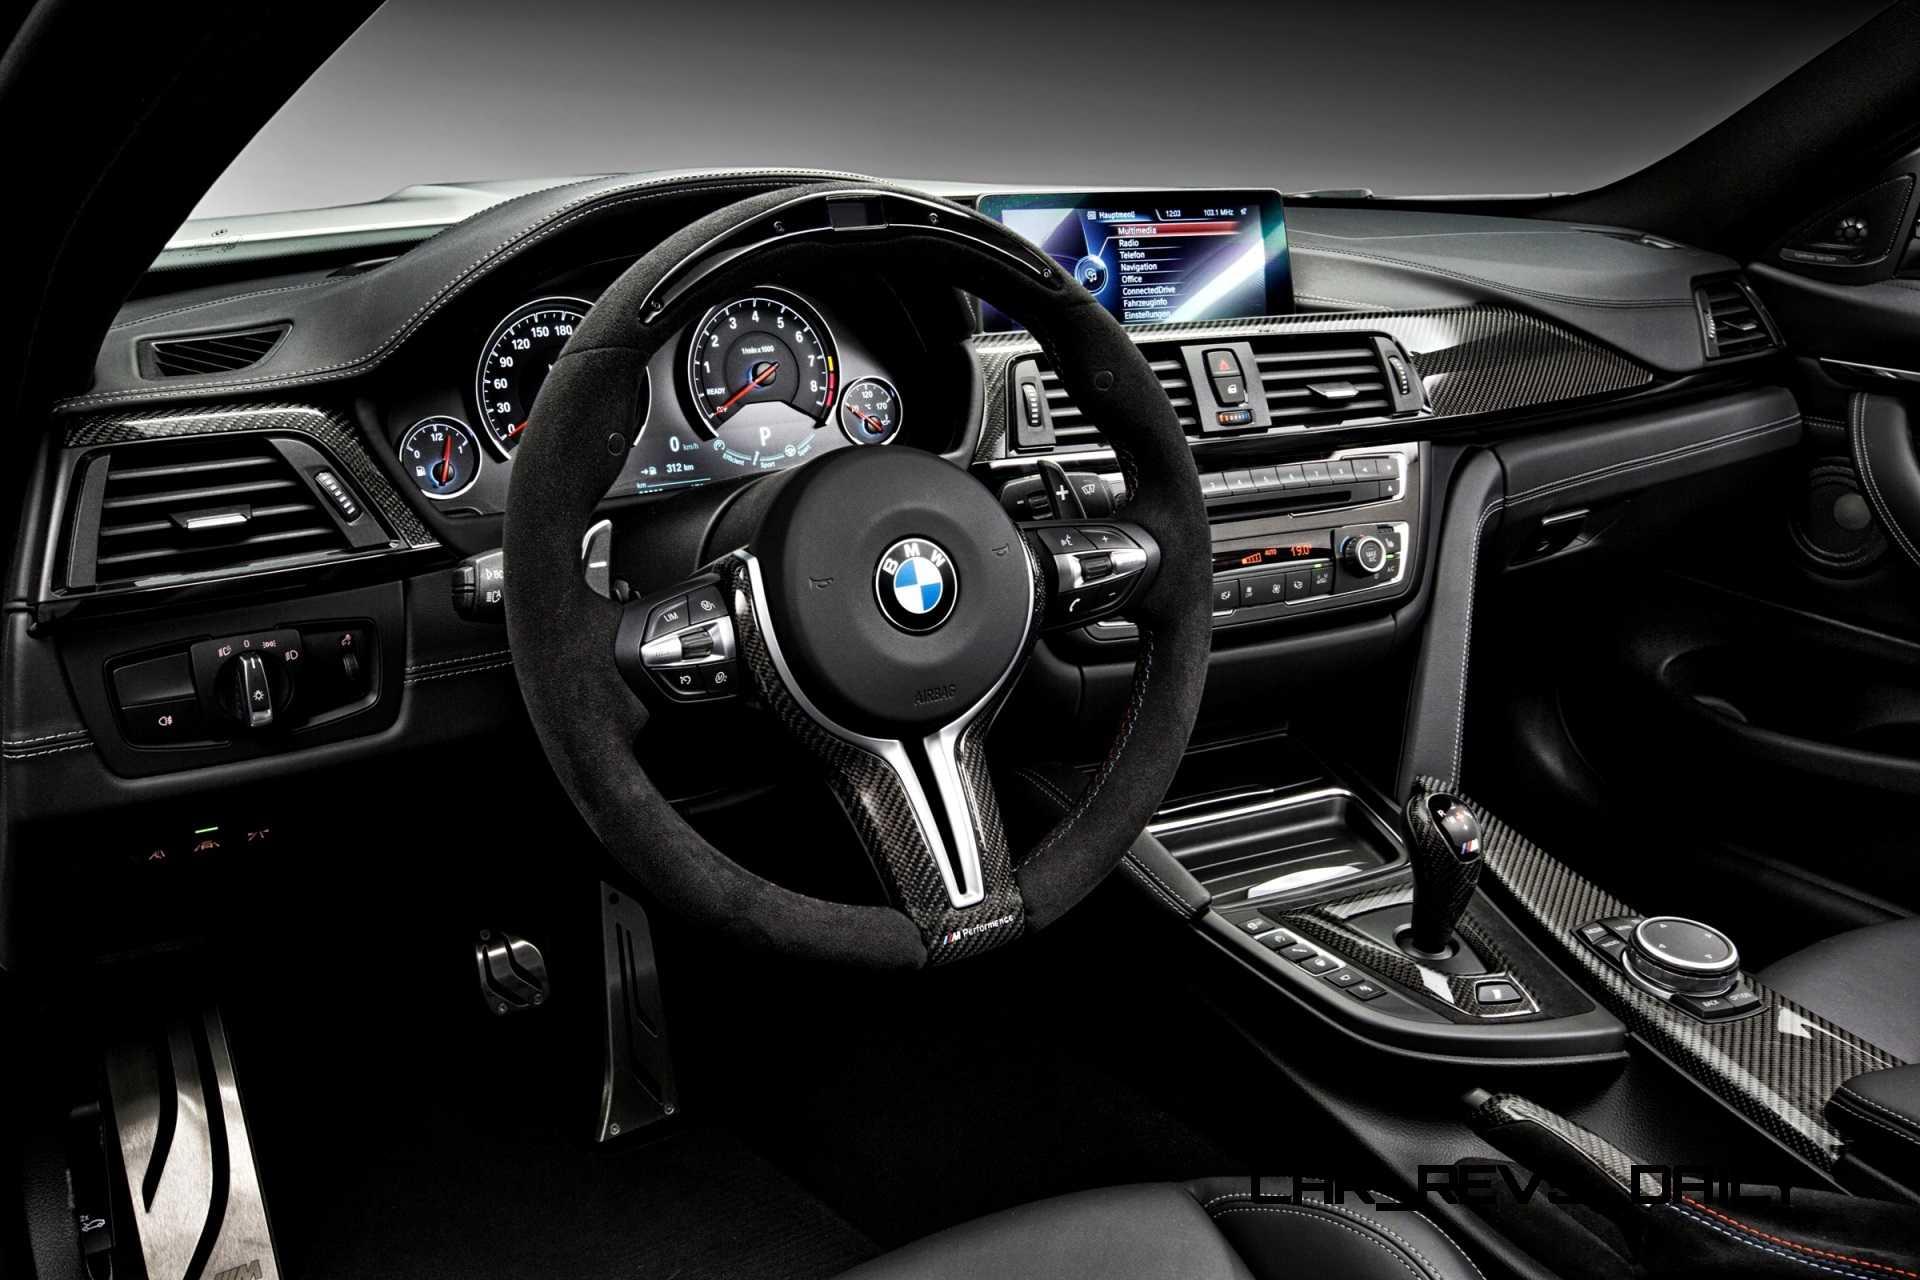 Car Dash Wallpaper 2015 Bmw M3 And M4 M Performance Parts